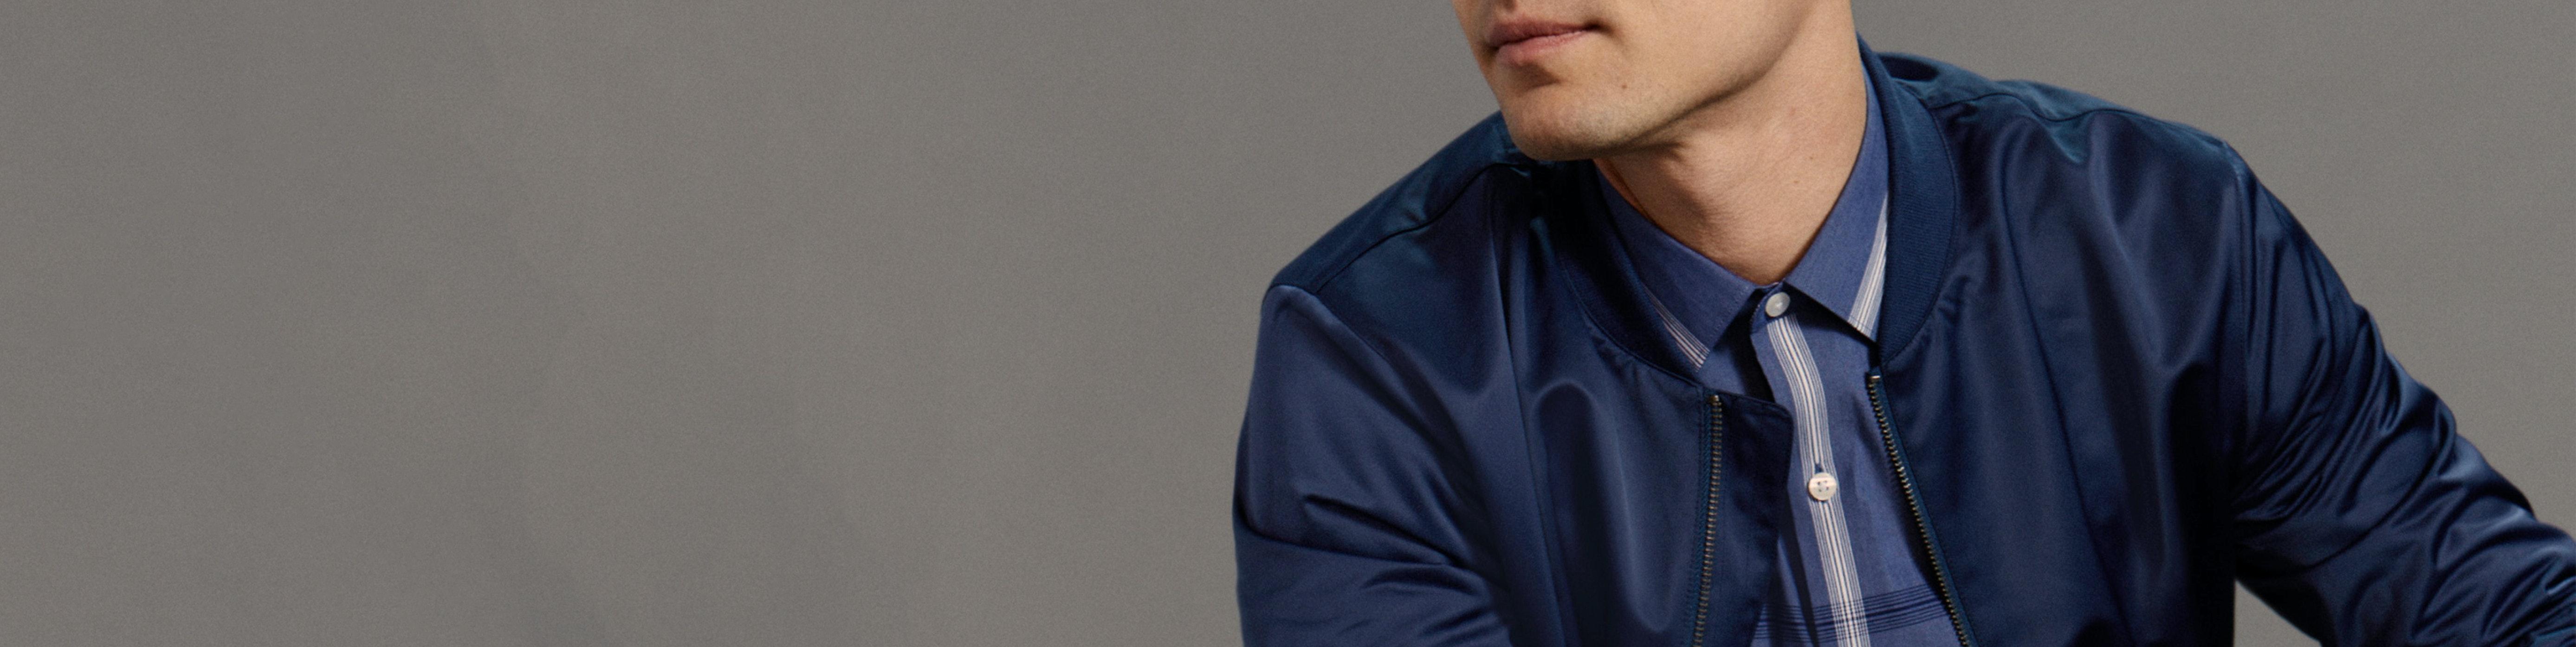 Shirt Jackets Hero Image